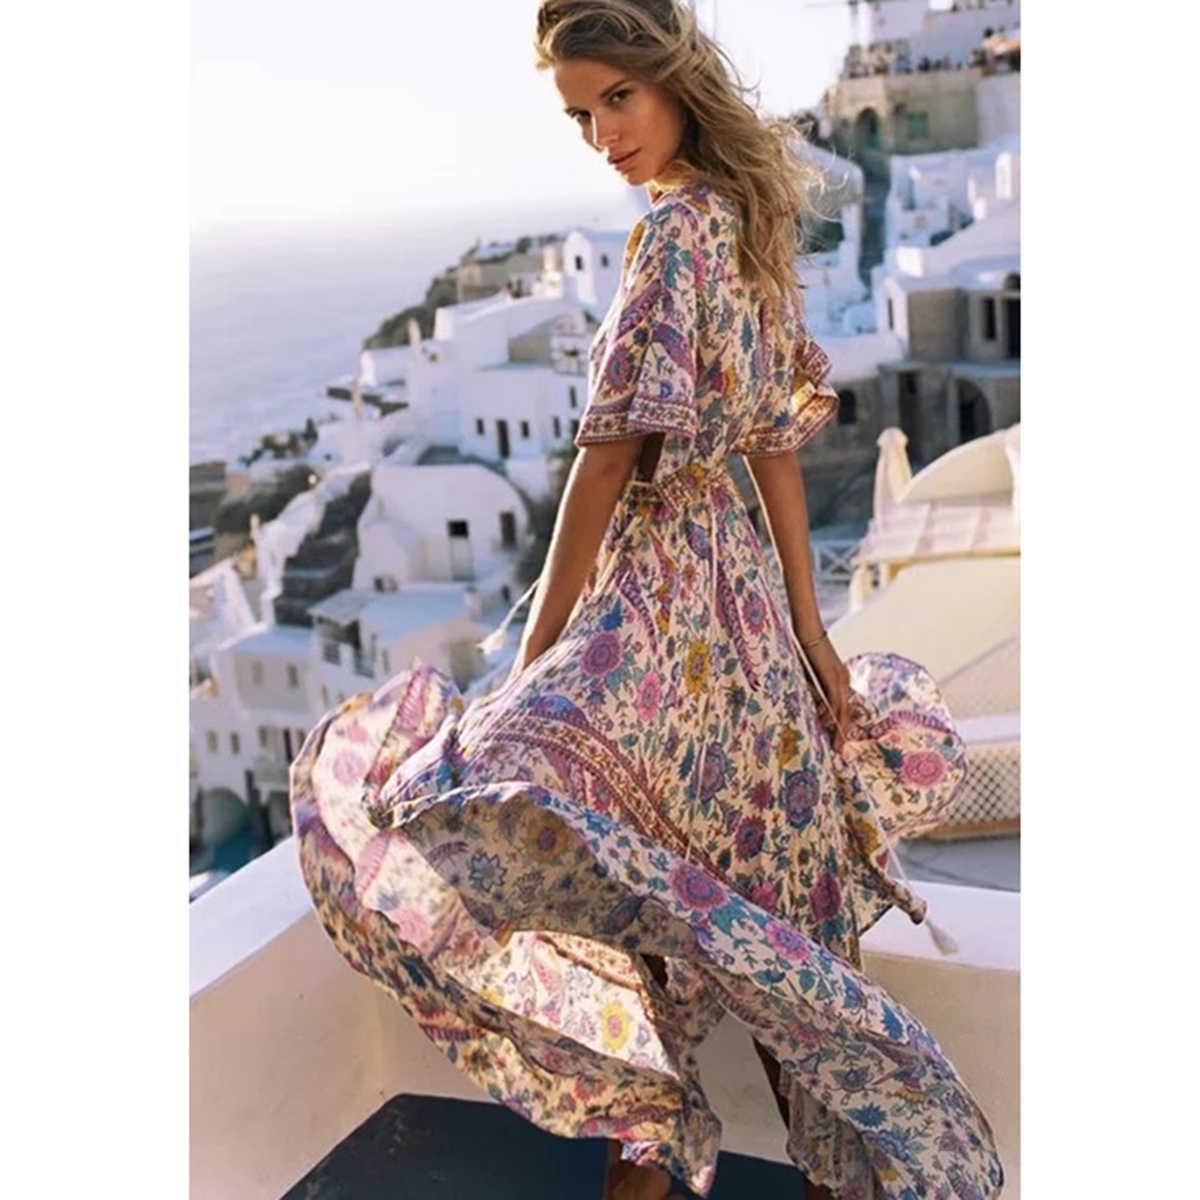 594558f0ca600 Lovebird Retro Boho Maxi Dress Women 2019 Summer Long Sleeve V neck Chic  Sexy Dress Ladies Big Hem Floral Print Beach Long Dress